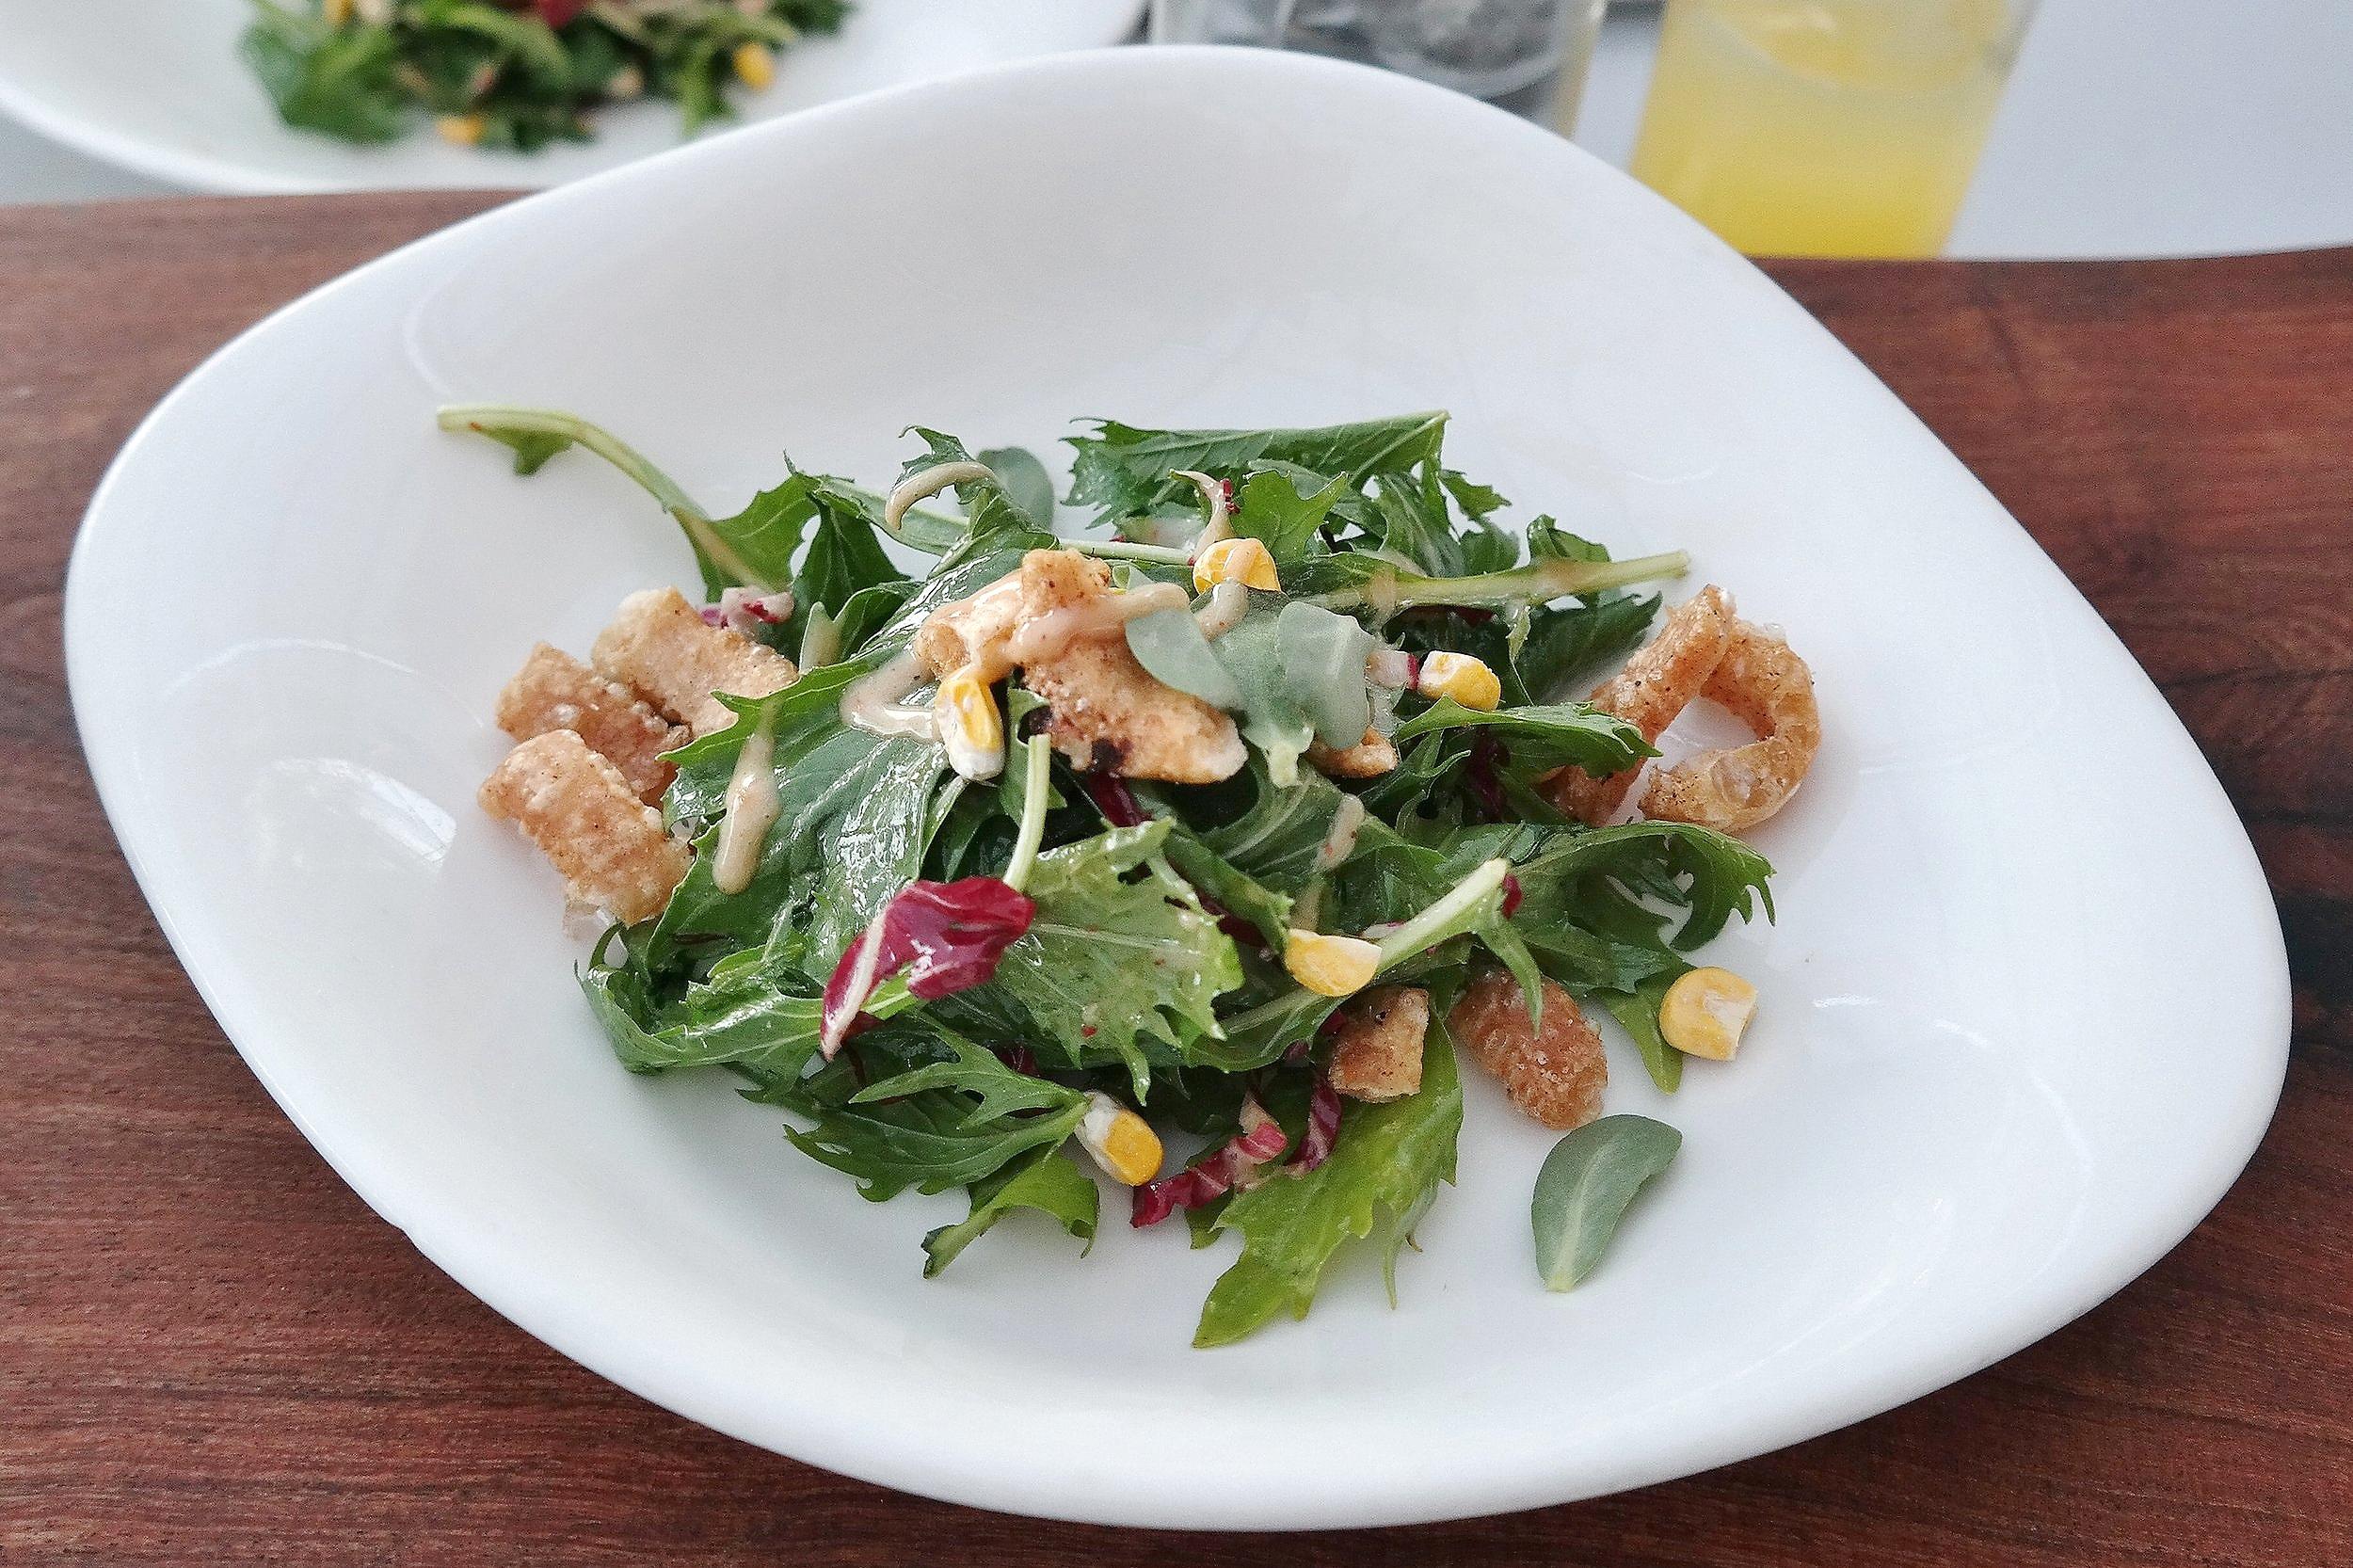 Tucson+23+chef+dinner+salad